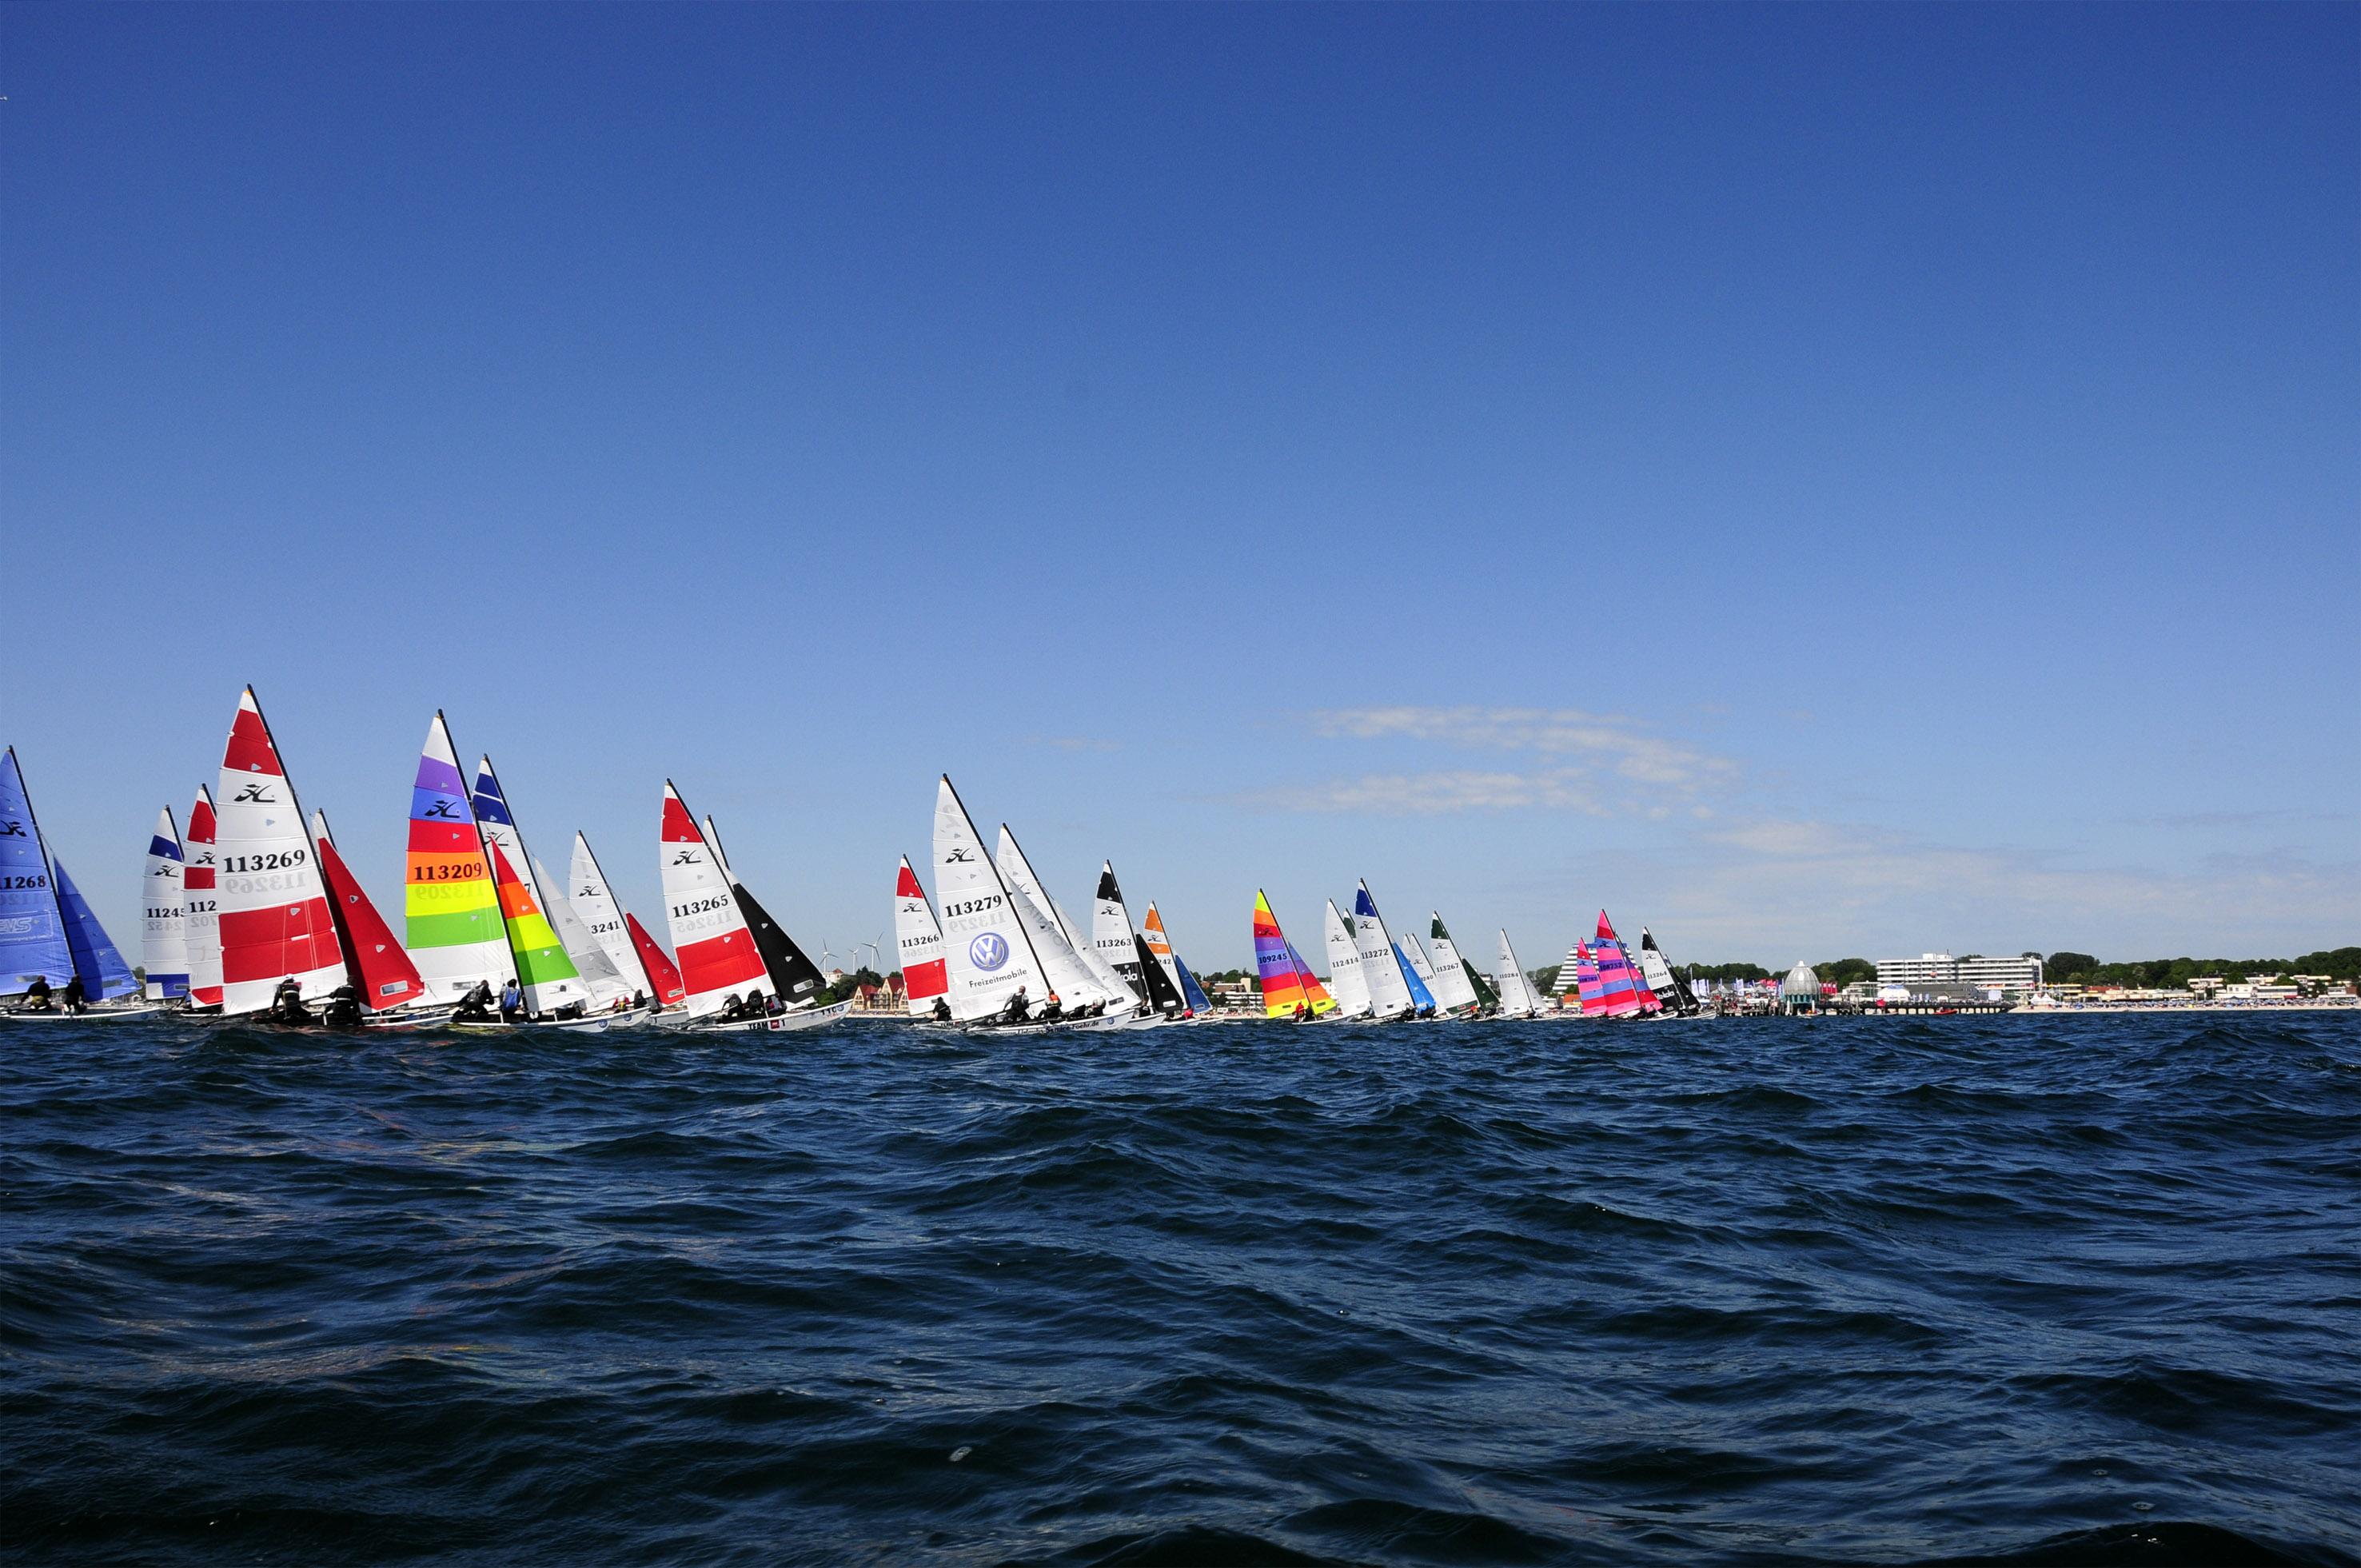 Super Sail Tour - Groemitz-01 - Jens Hannemann